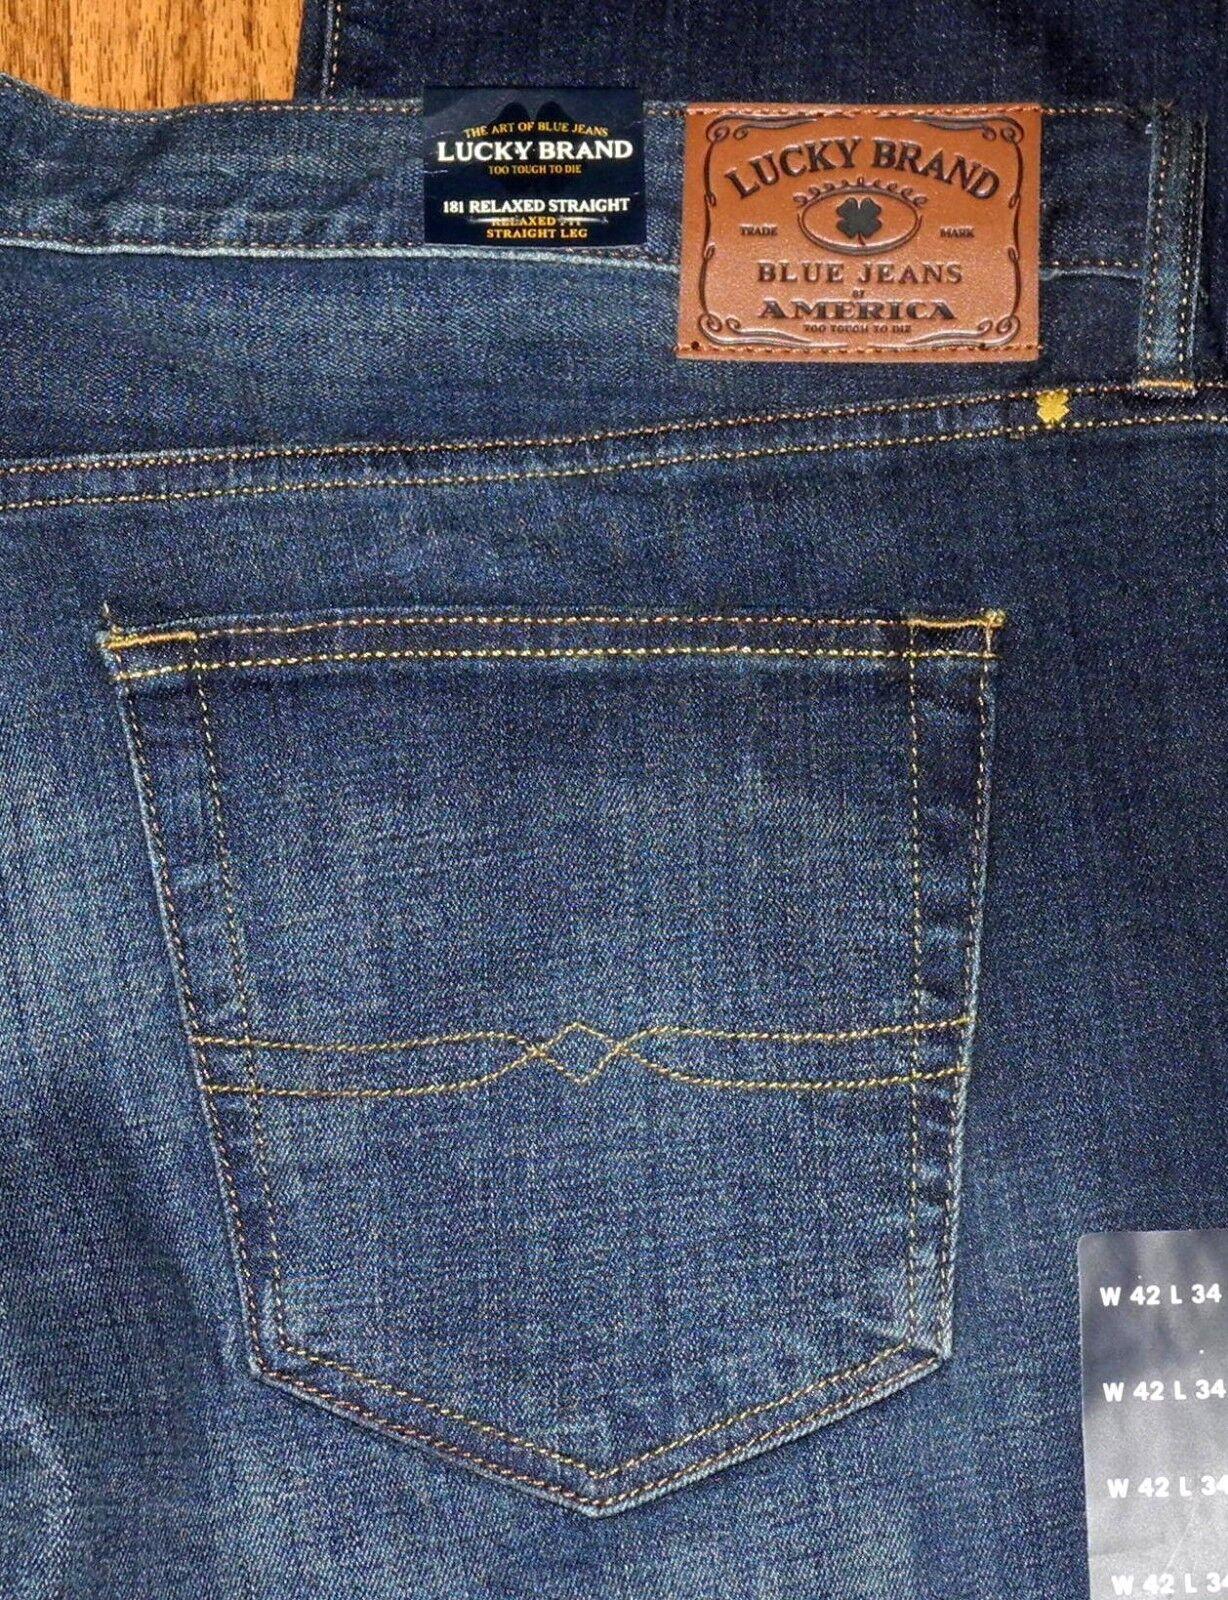 02e2fabe79 Nuovo Lucky Brand 181 Morbido Dritto Uomo Uomo Uomo Jeans Blu Taglie 33x30  33x32 33x34 af77f3